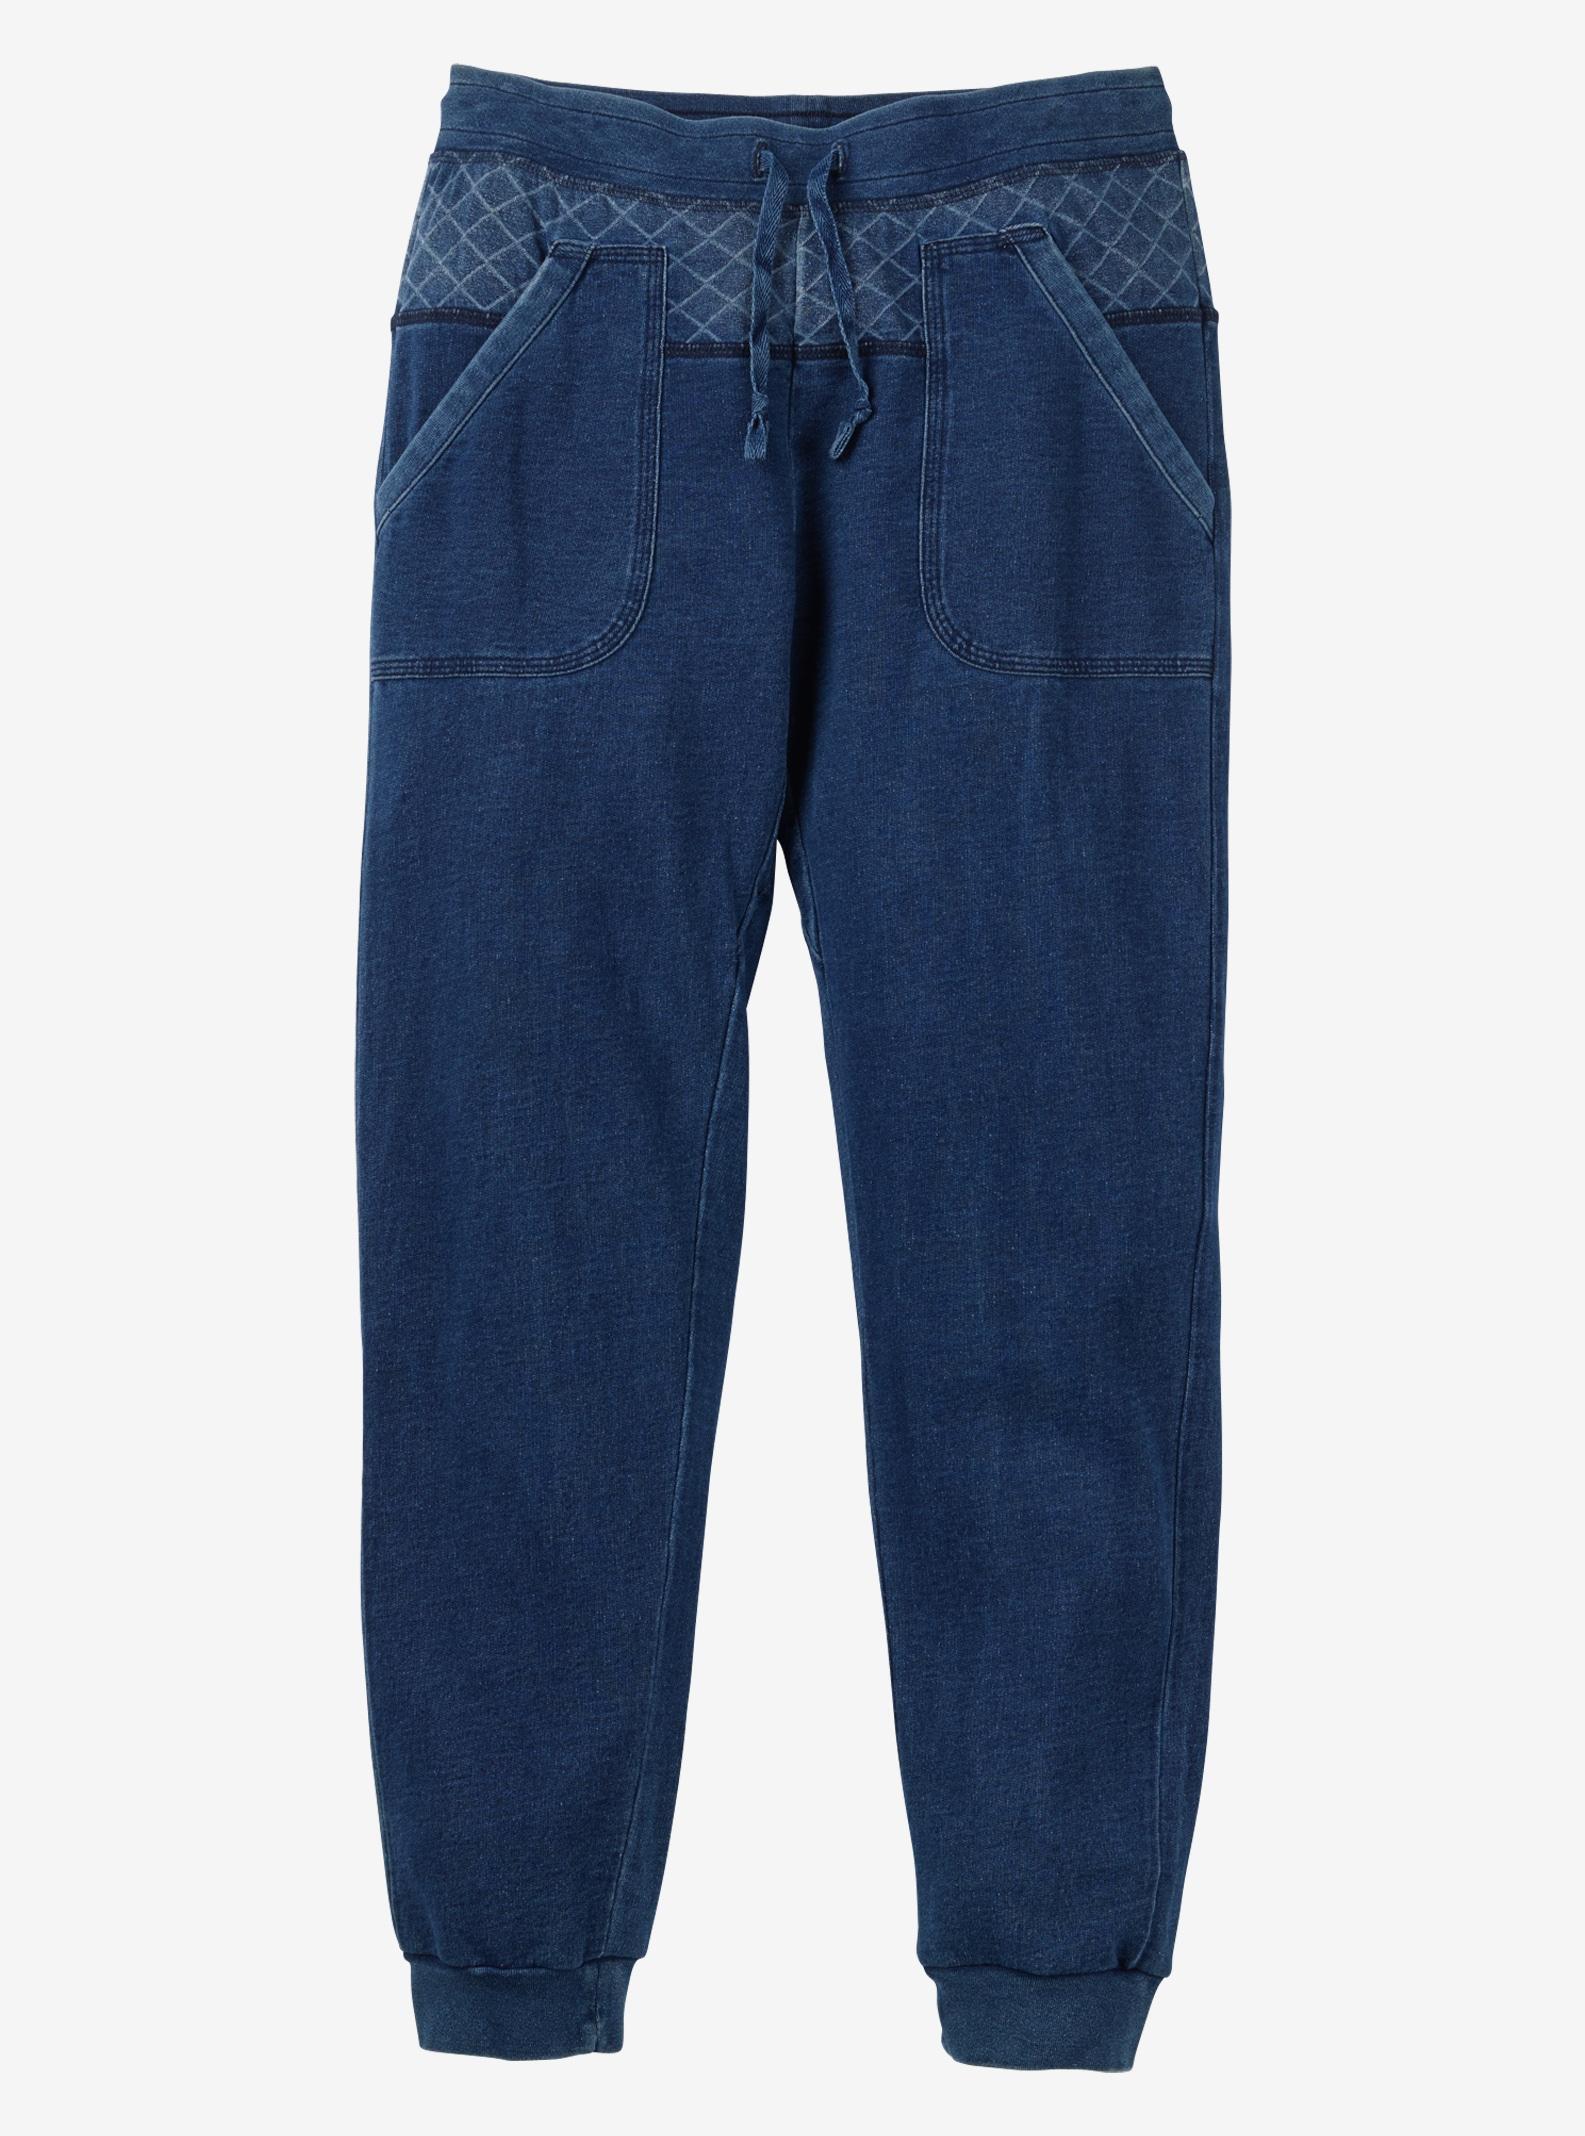 Burton - Pantalon Noonmark affichage en Indigo